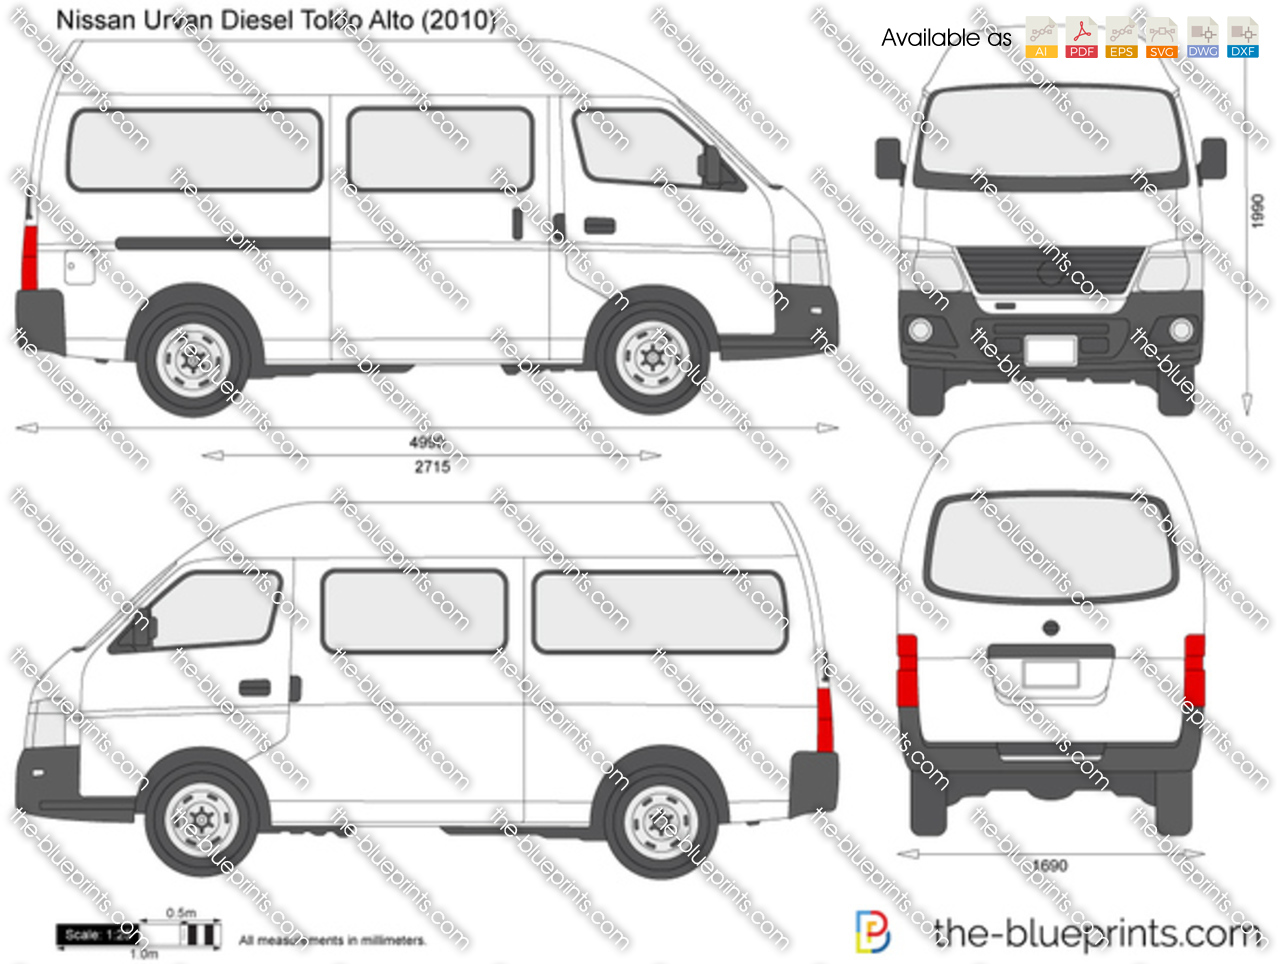 Nissan Urvan Diesel Toldo Alto Vector Drawing